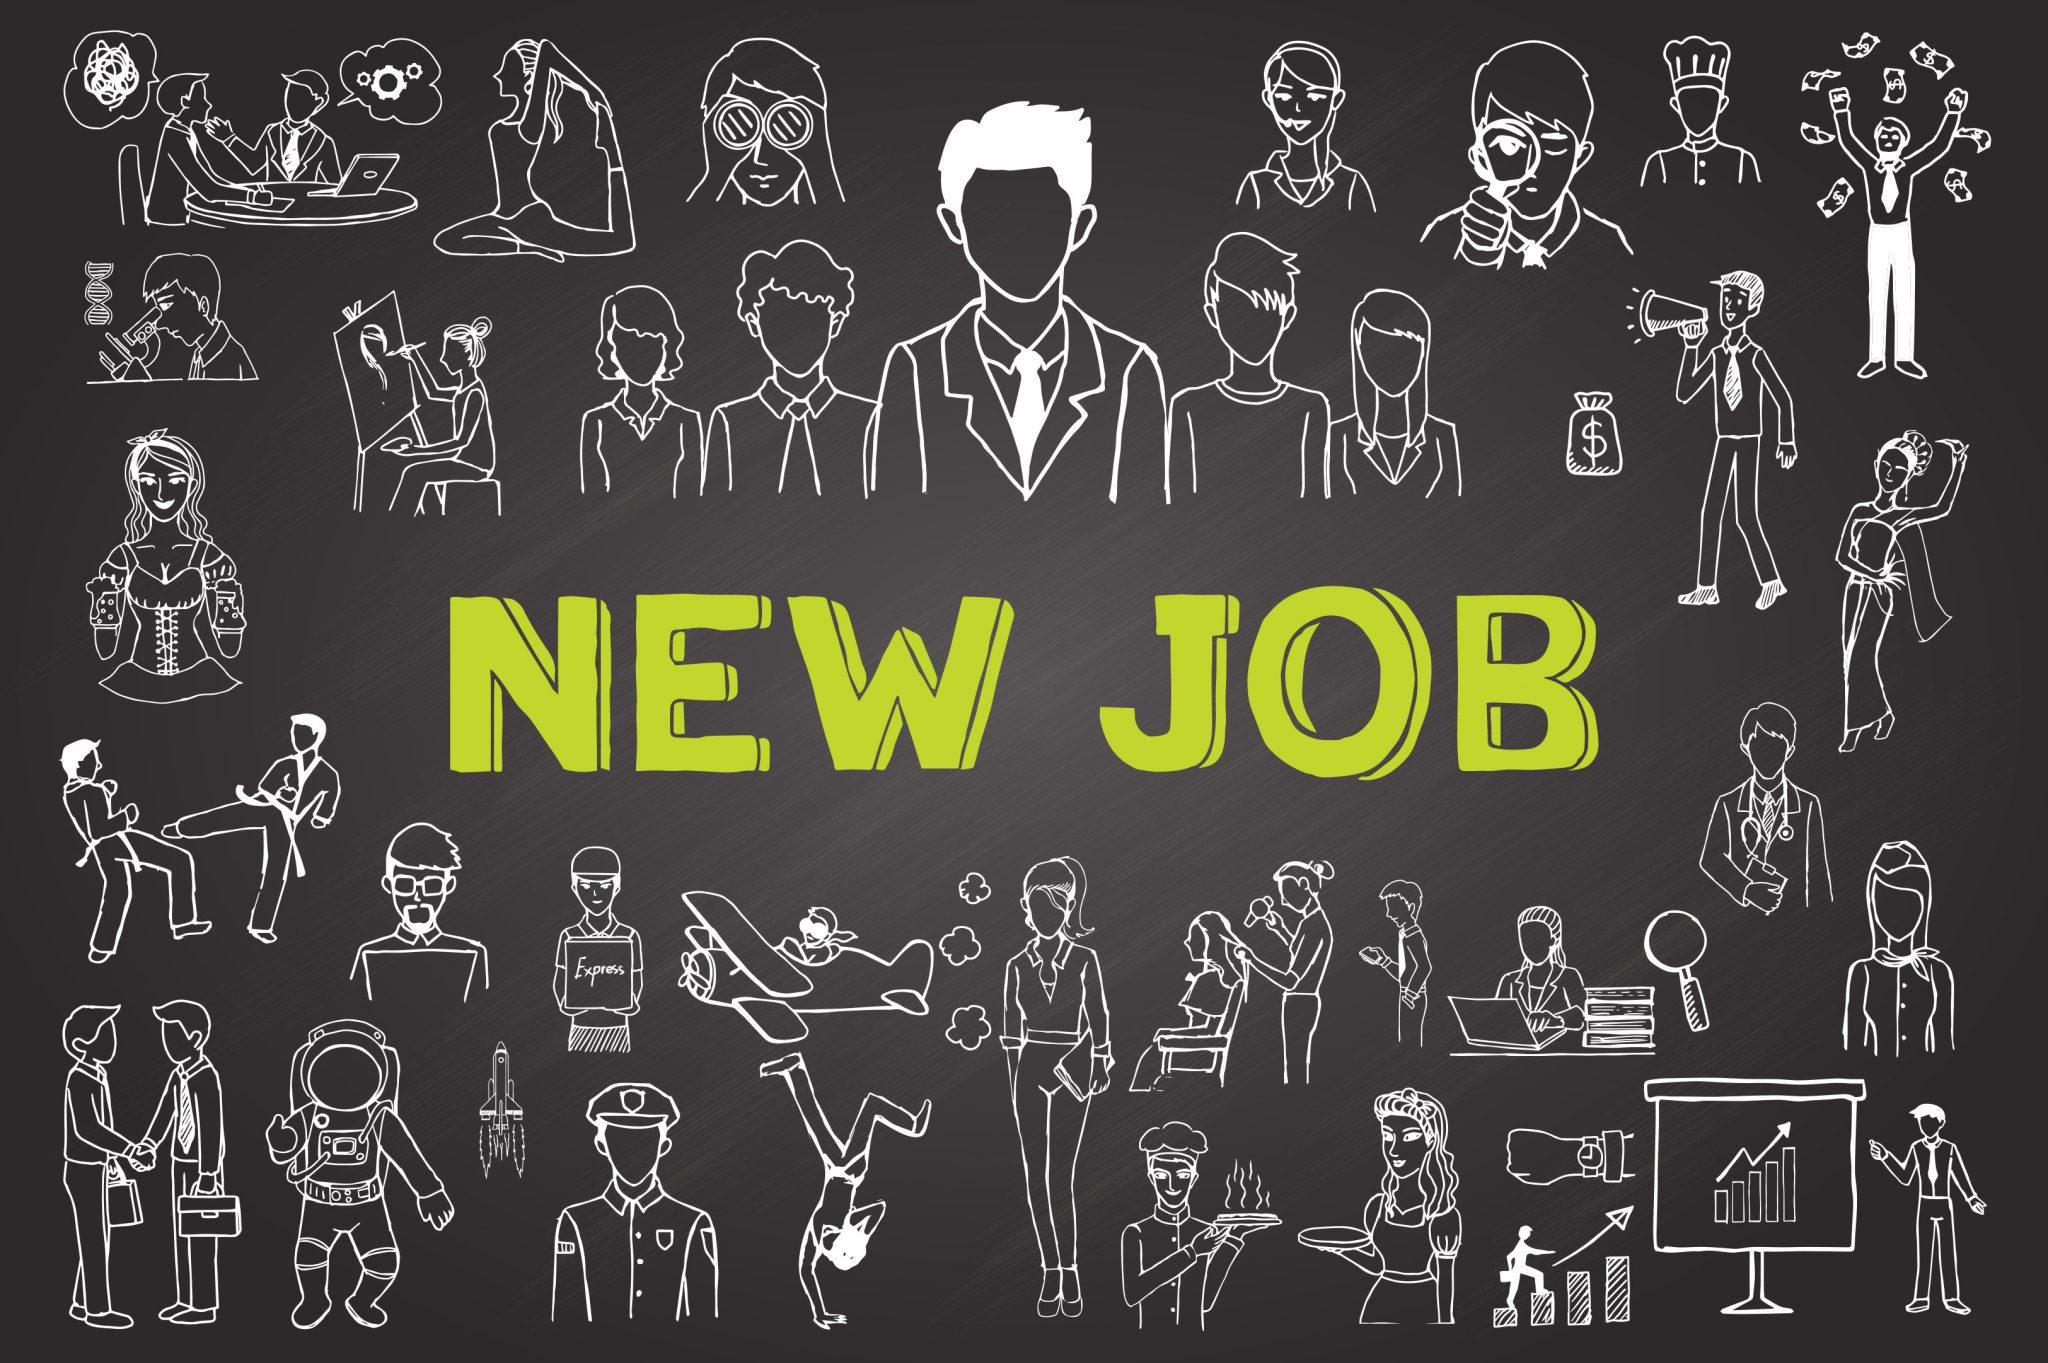 chalkboard doodle new job 101657090 GCC green